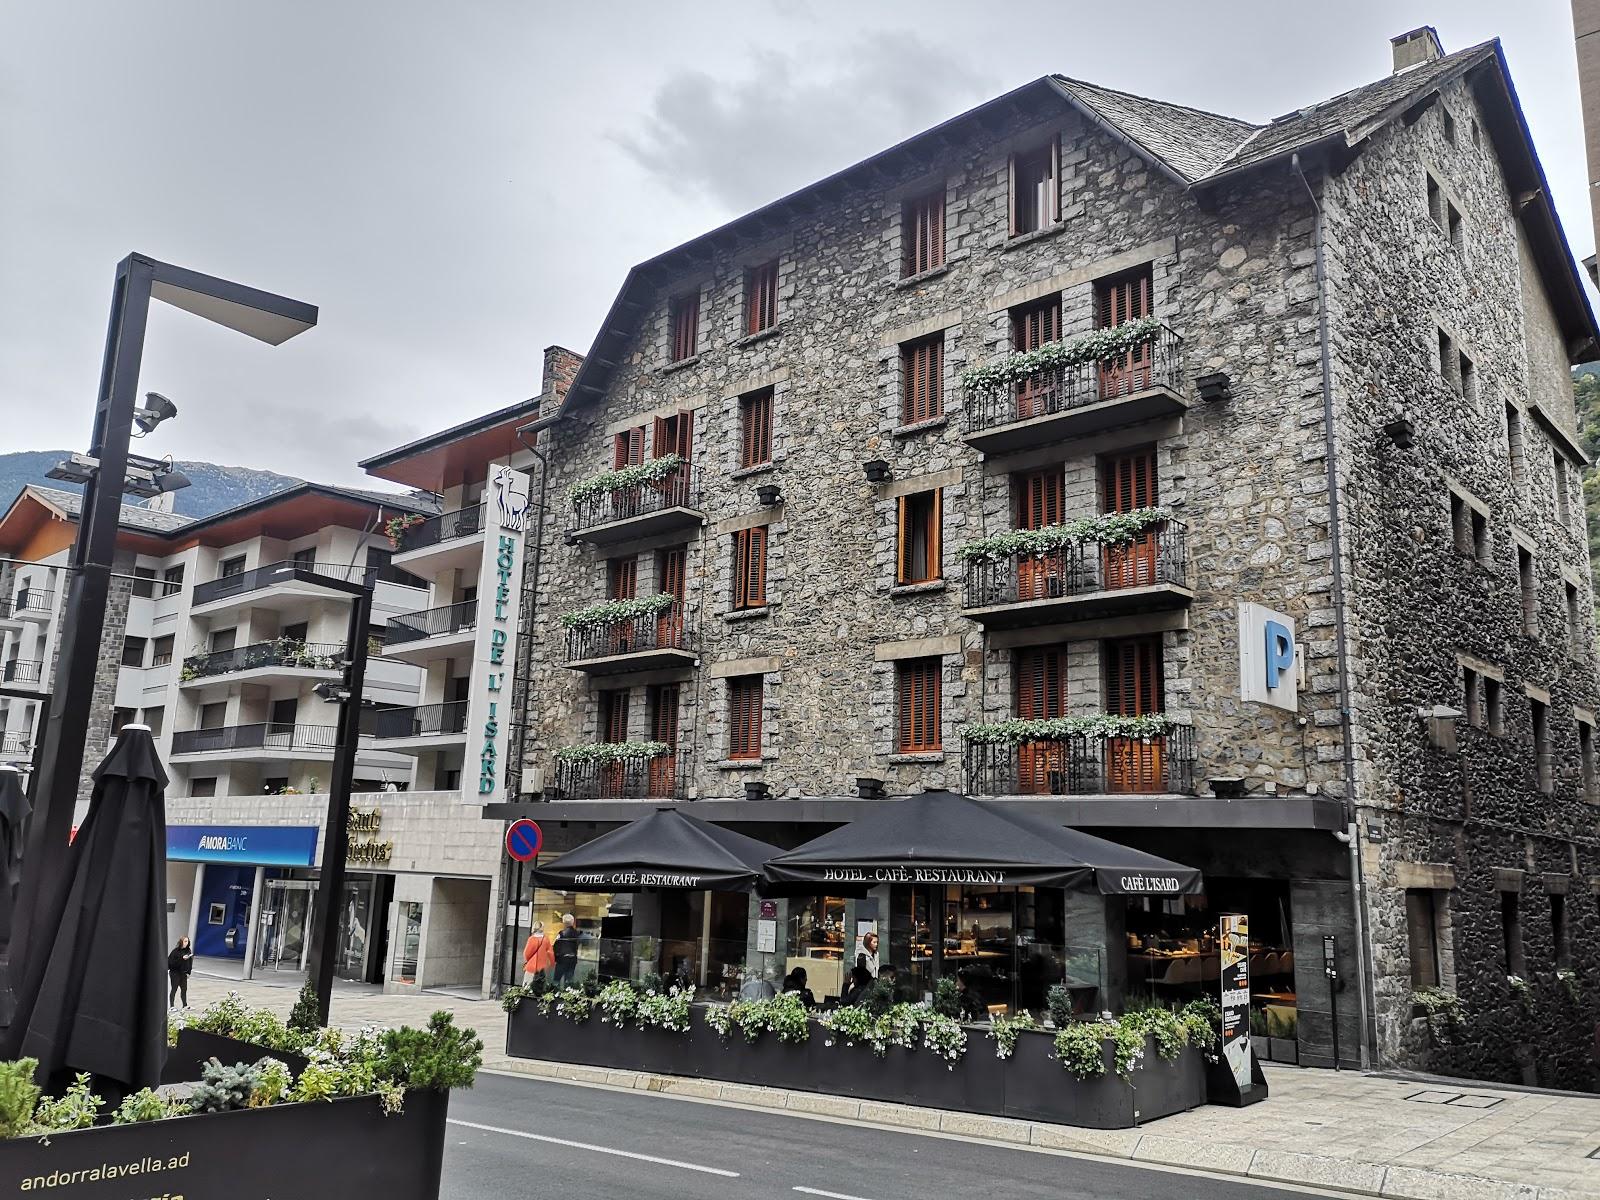 Андорра - Португалия (Лагуш) - Испания (Тосса-де-Мар, Жирона)